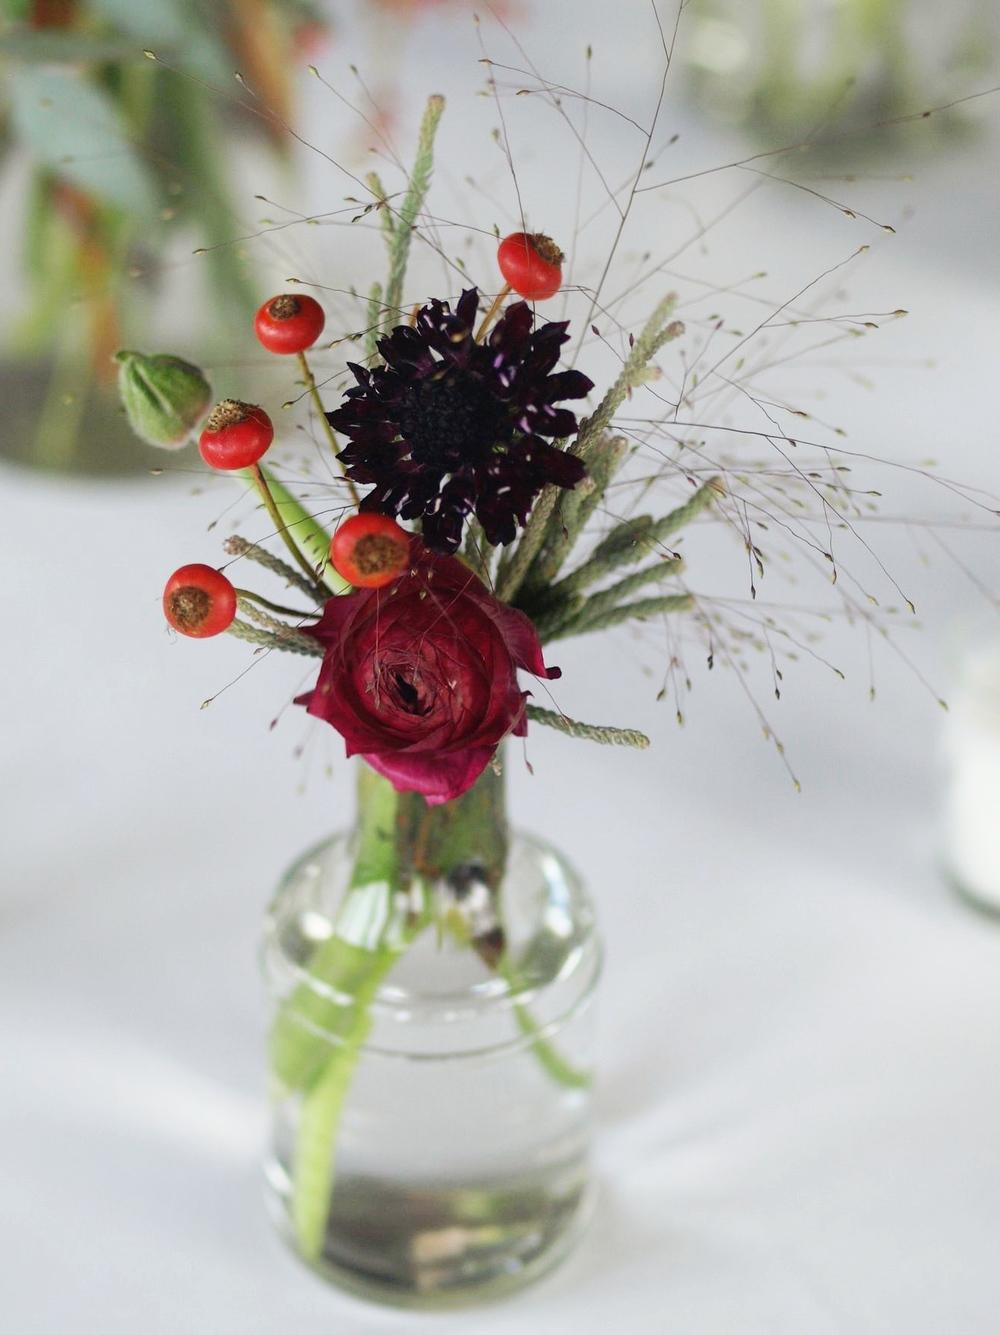 Oreonta house woodstock wedding bud vase with burgundy ranunculous, , grey brunia, red berries and red rosehips and wildflowers rosehip social rosehip floral wild grass.jpg